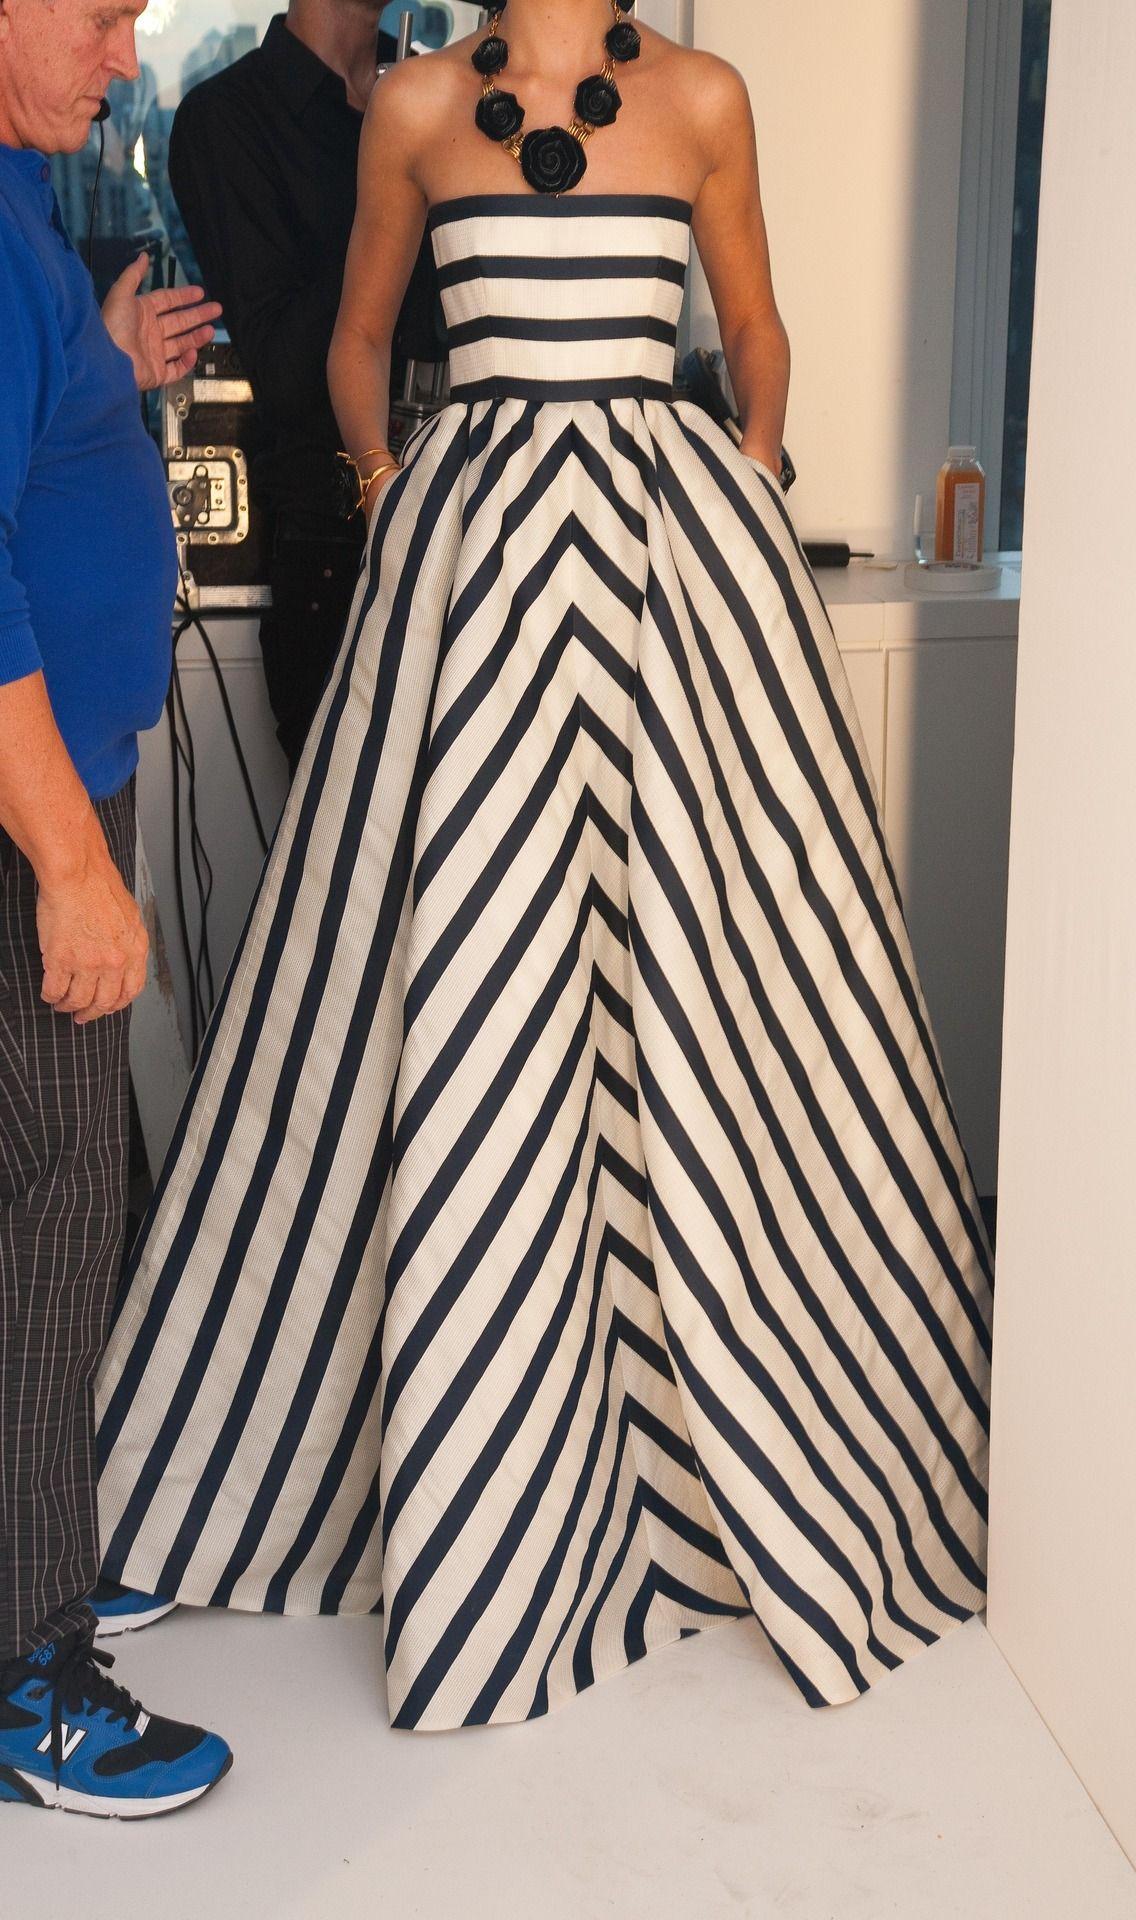 Stripes on stripes! | My Style | Pinterest | Rehearsal dinner ...